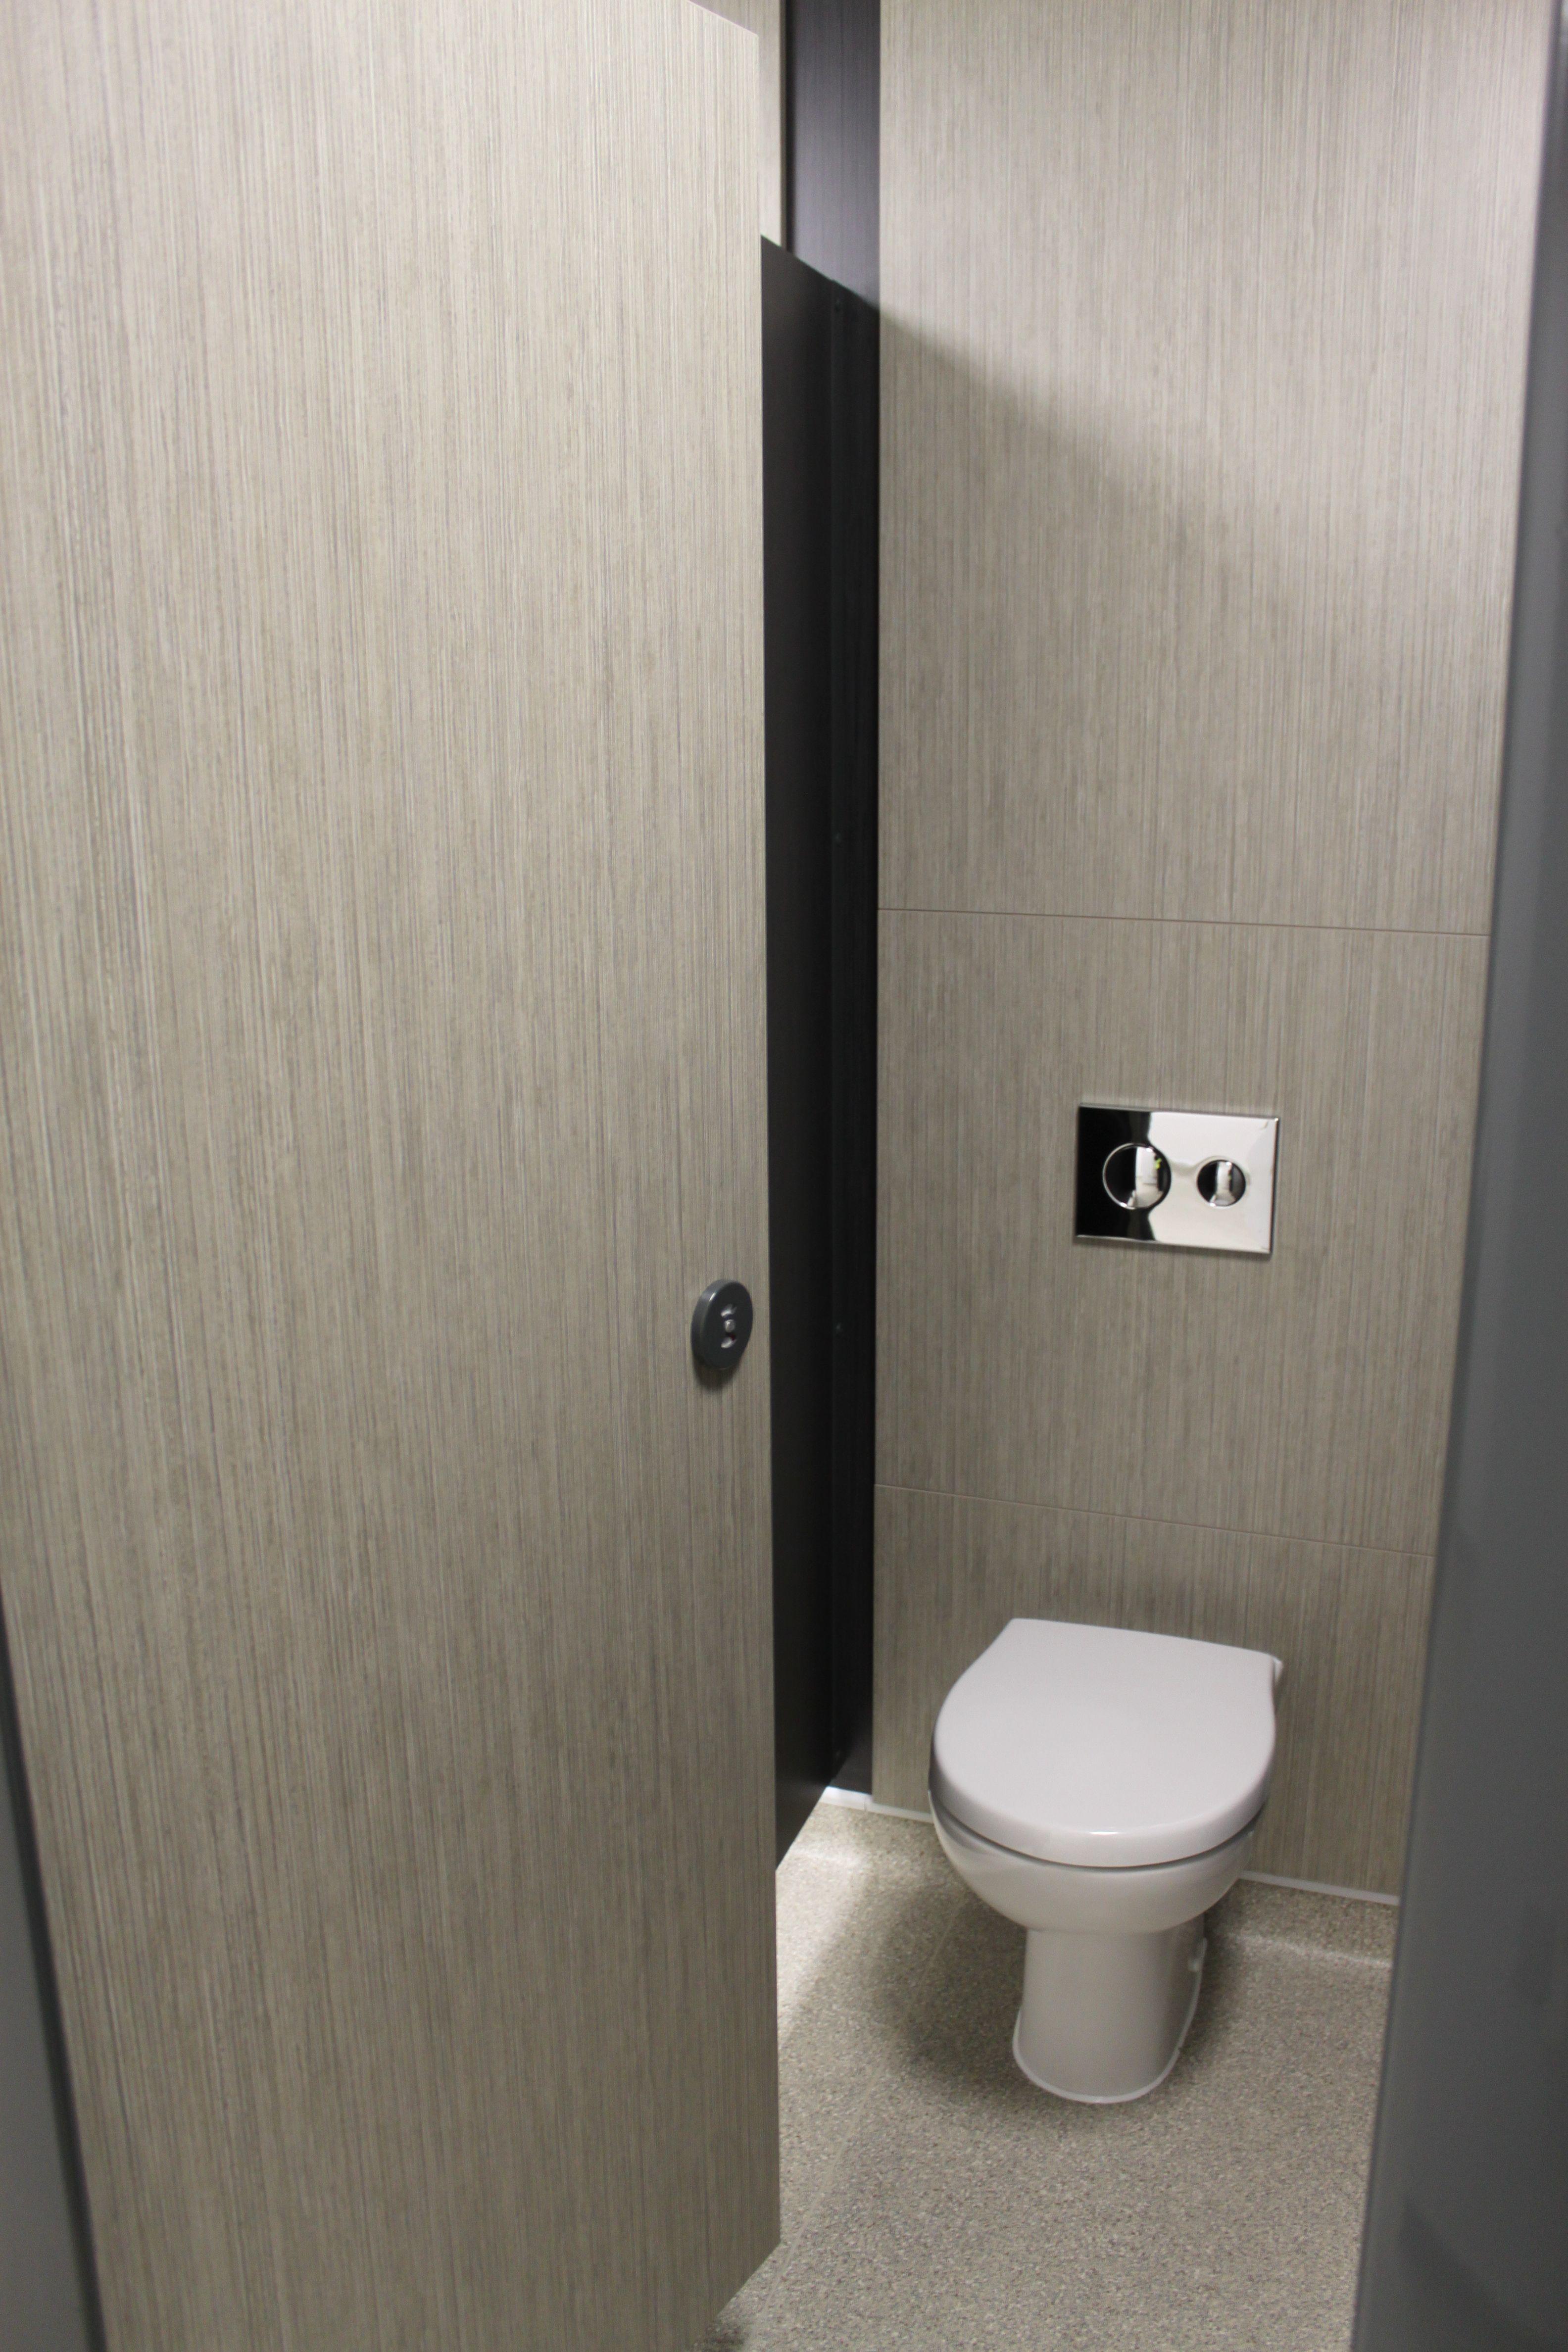 Bathroom Partition Walls High End Toilet Partition Google Search Acmp Wgh Pinterest